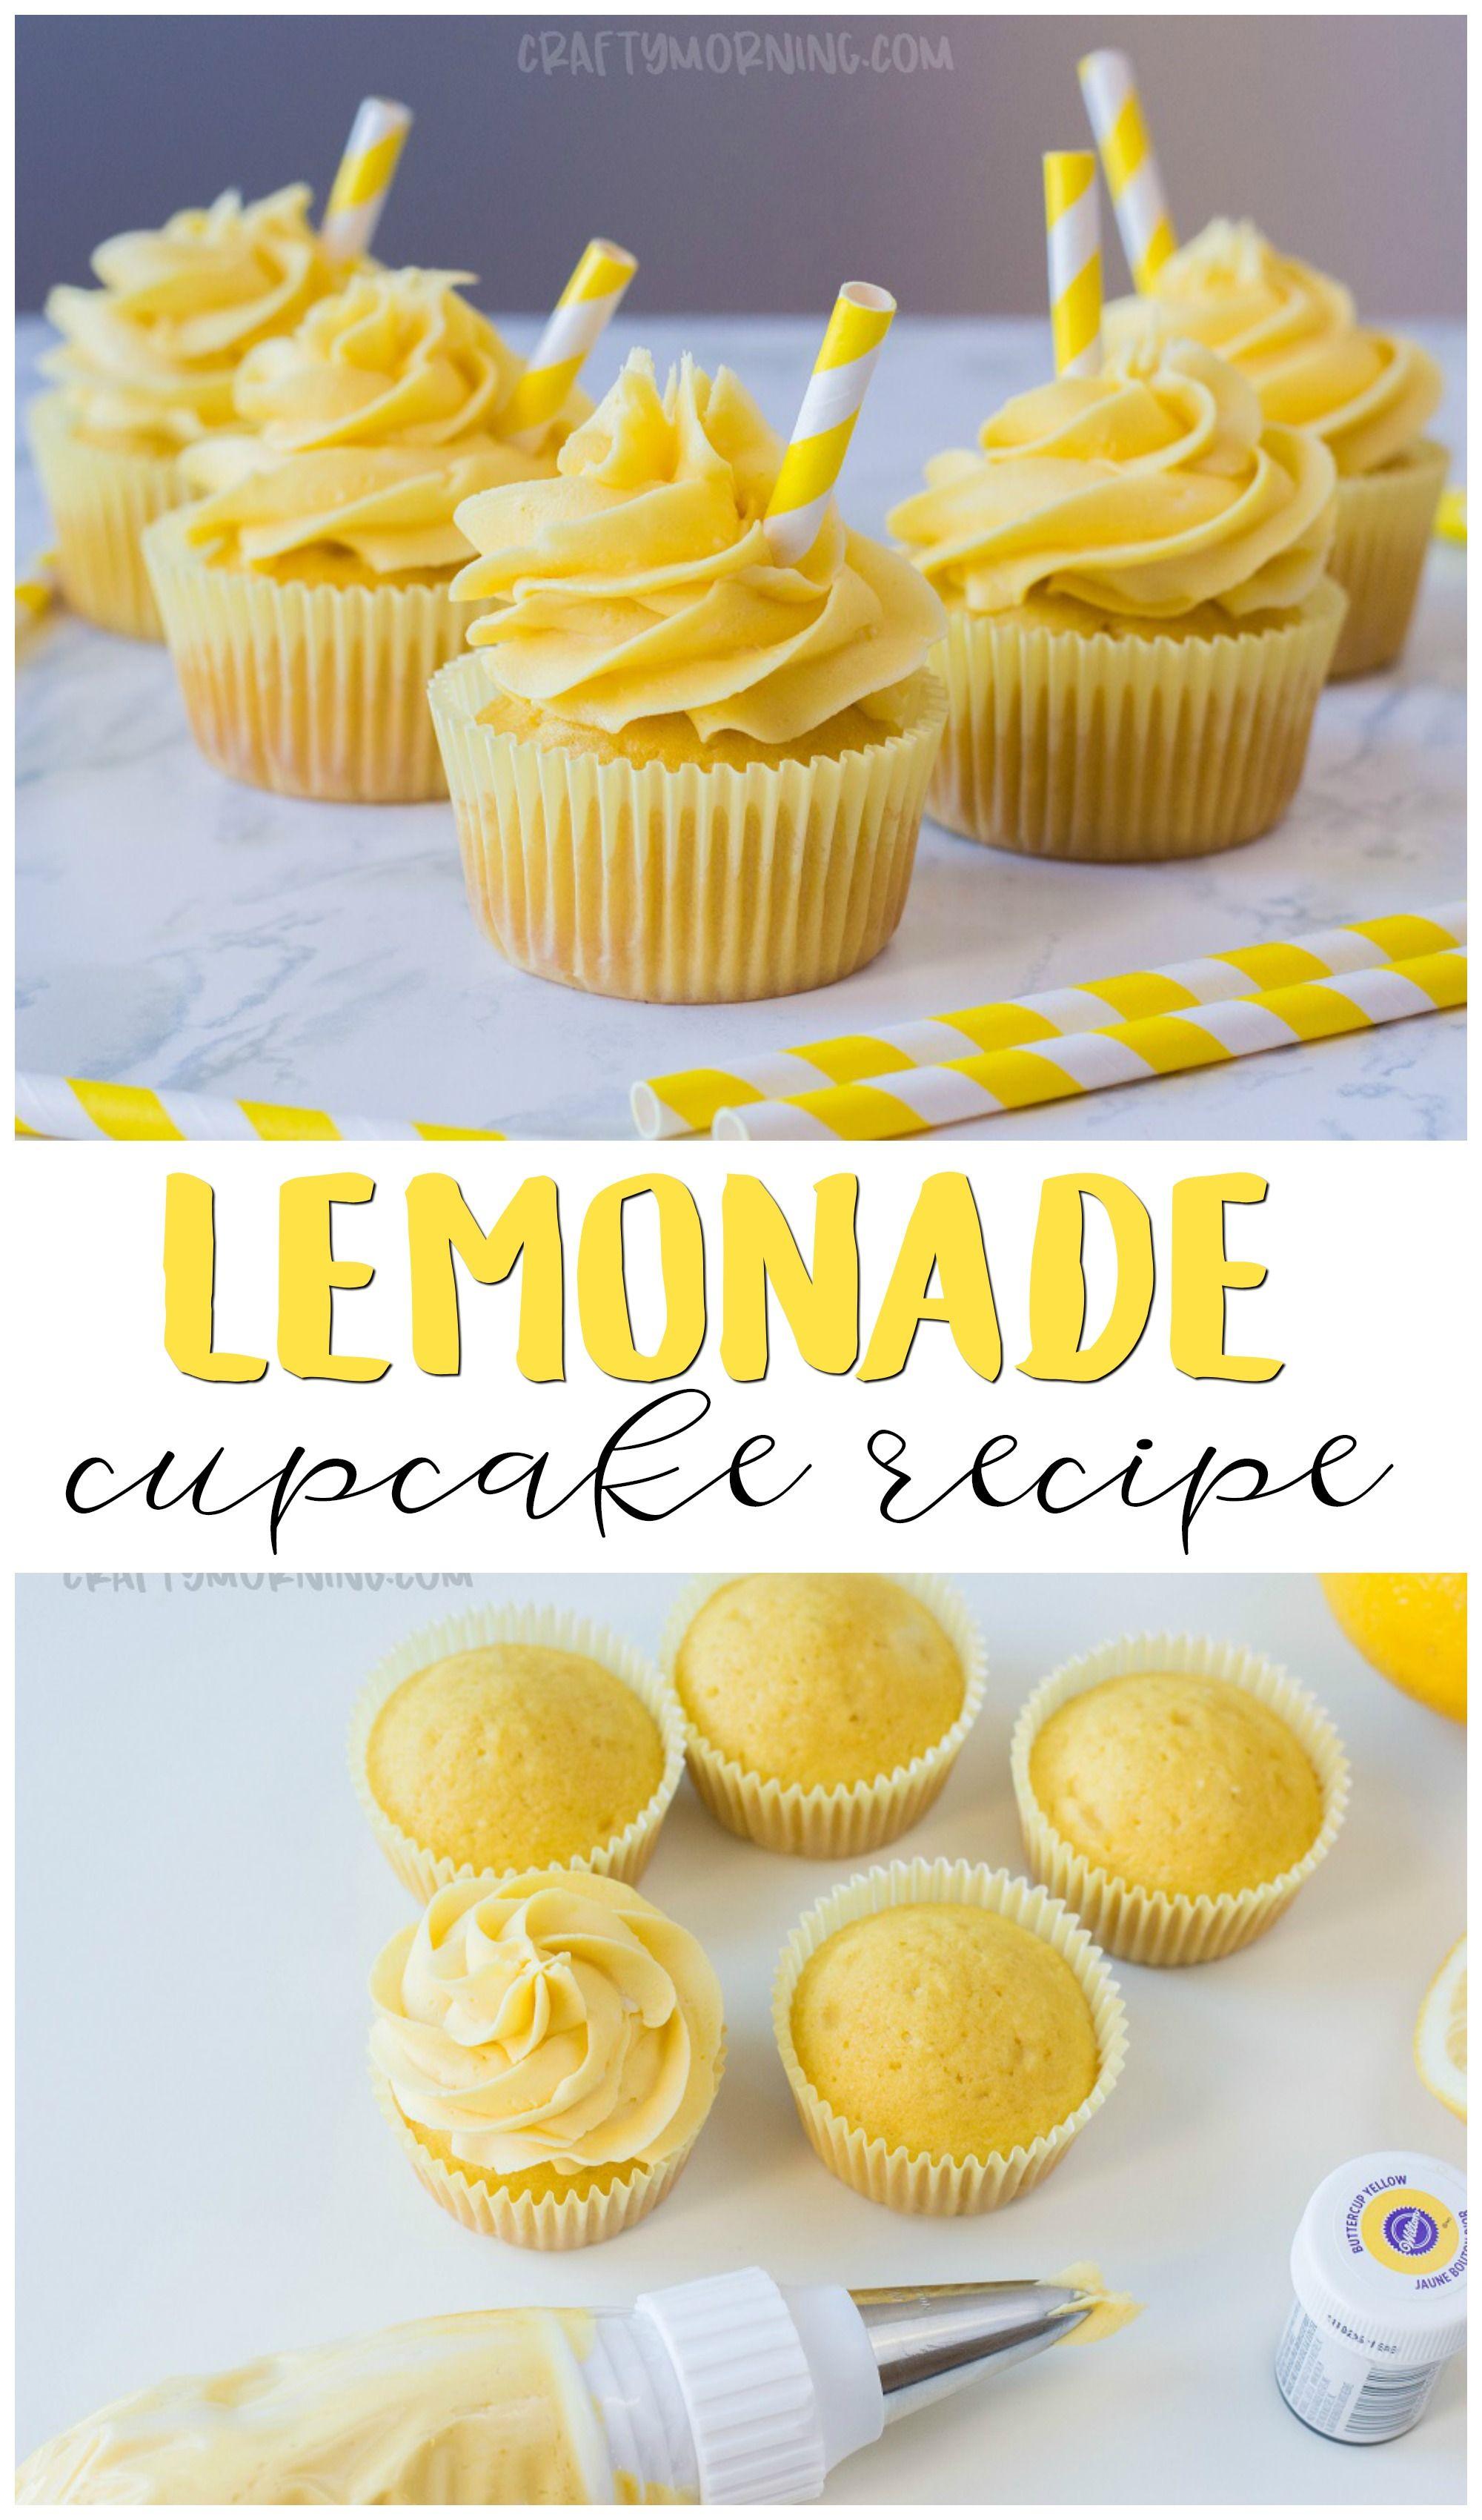 Lemonade Cupcake Recipe Delicious Lemon Cupcakes To Make For